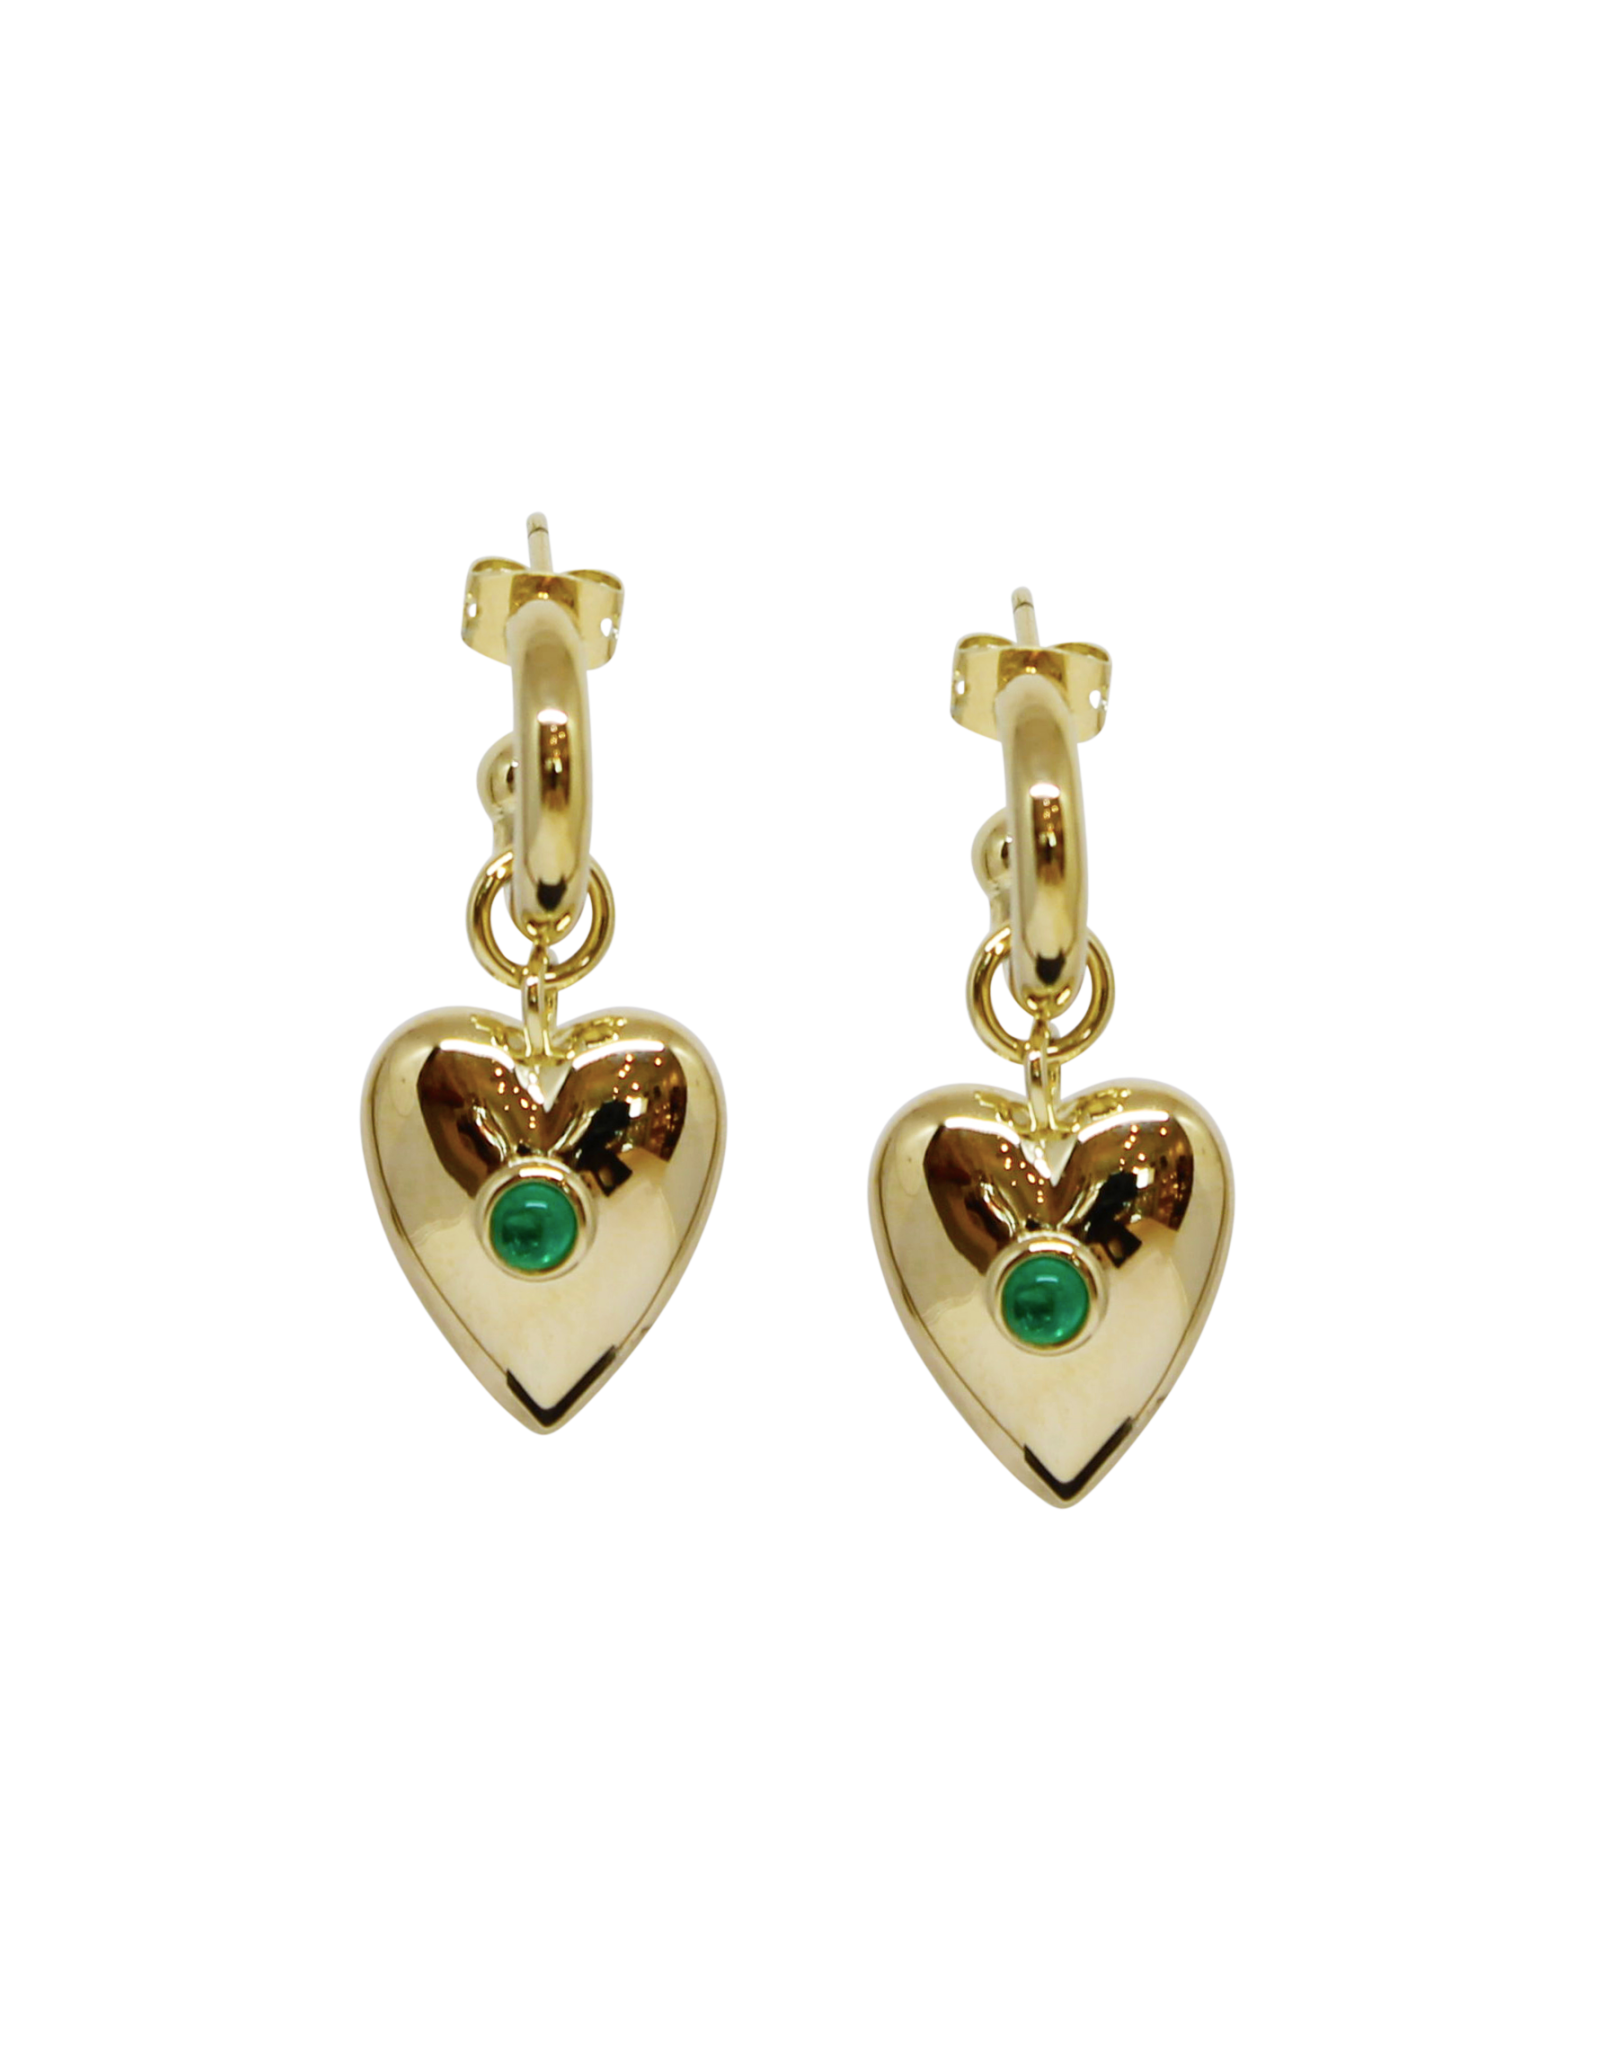 Vayu Jewels Ines Hoops - Emerald Green